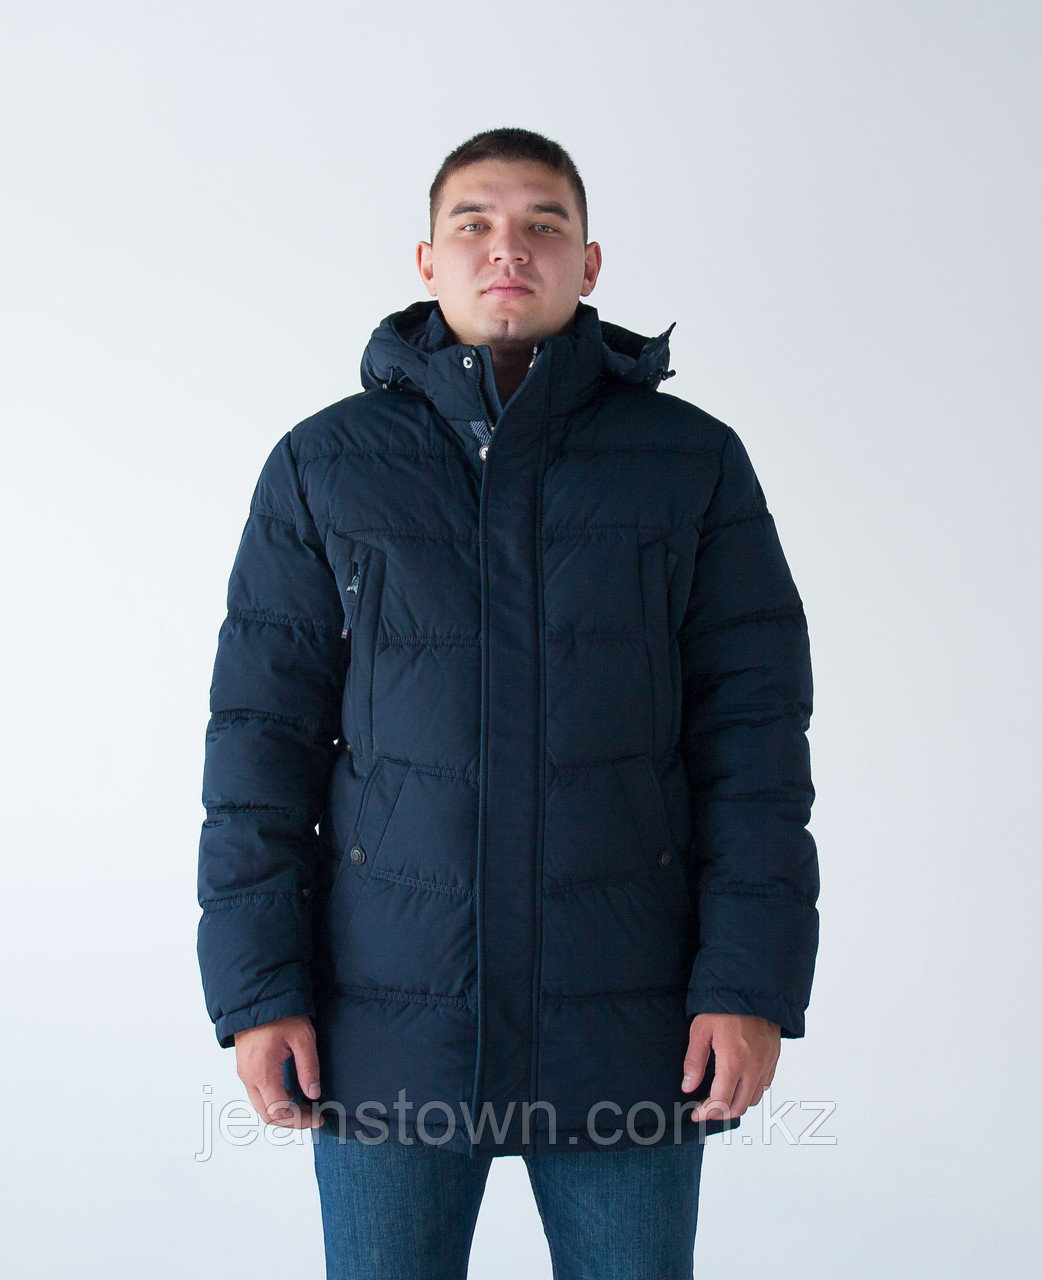 Длинная  зимняя мужская куртка  KINGS WIND   синяя